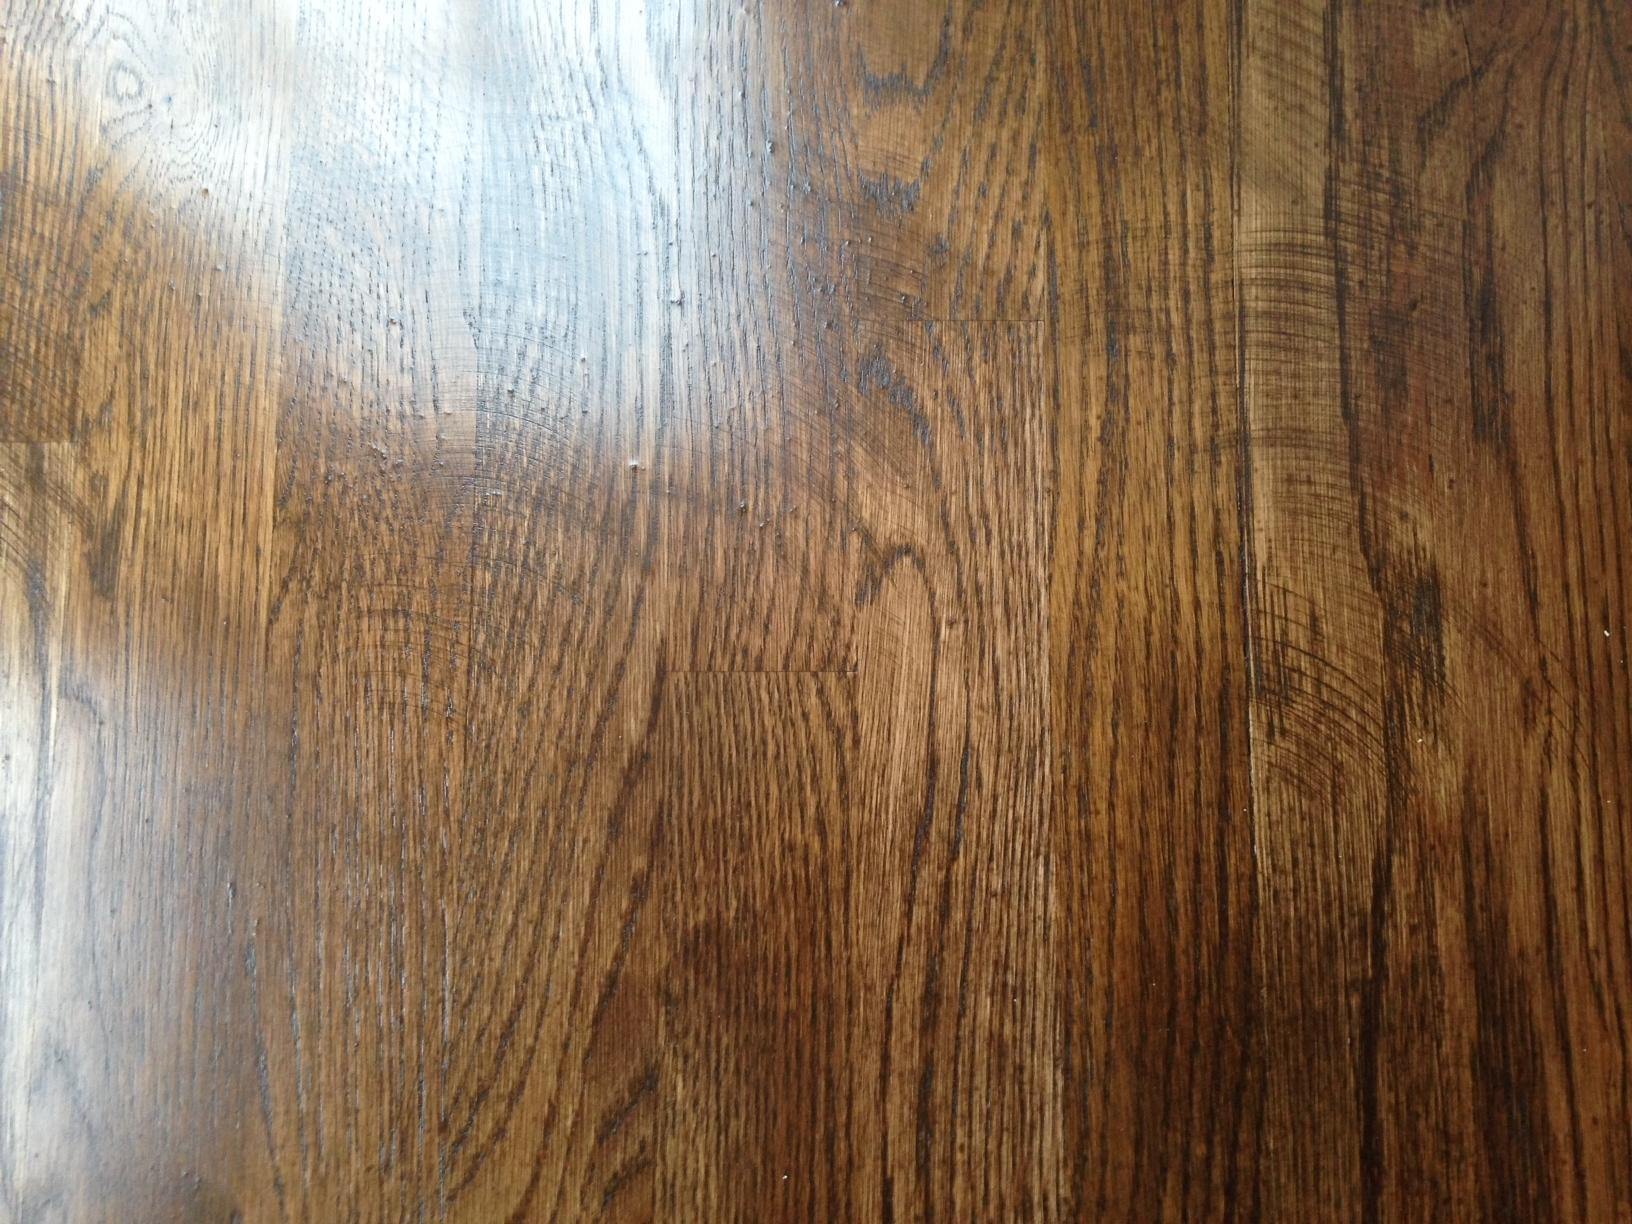 Hardwood Floor With Swirls